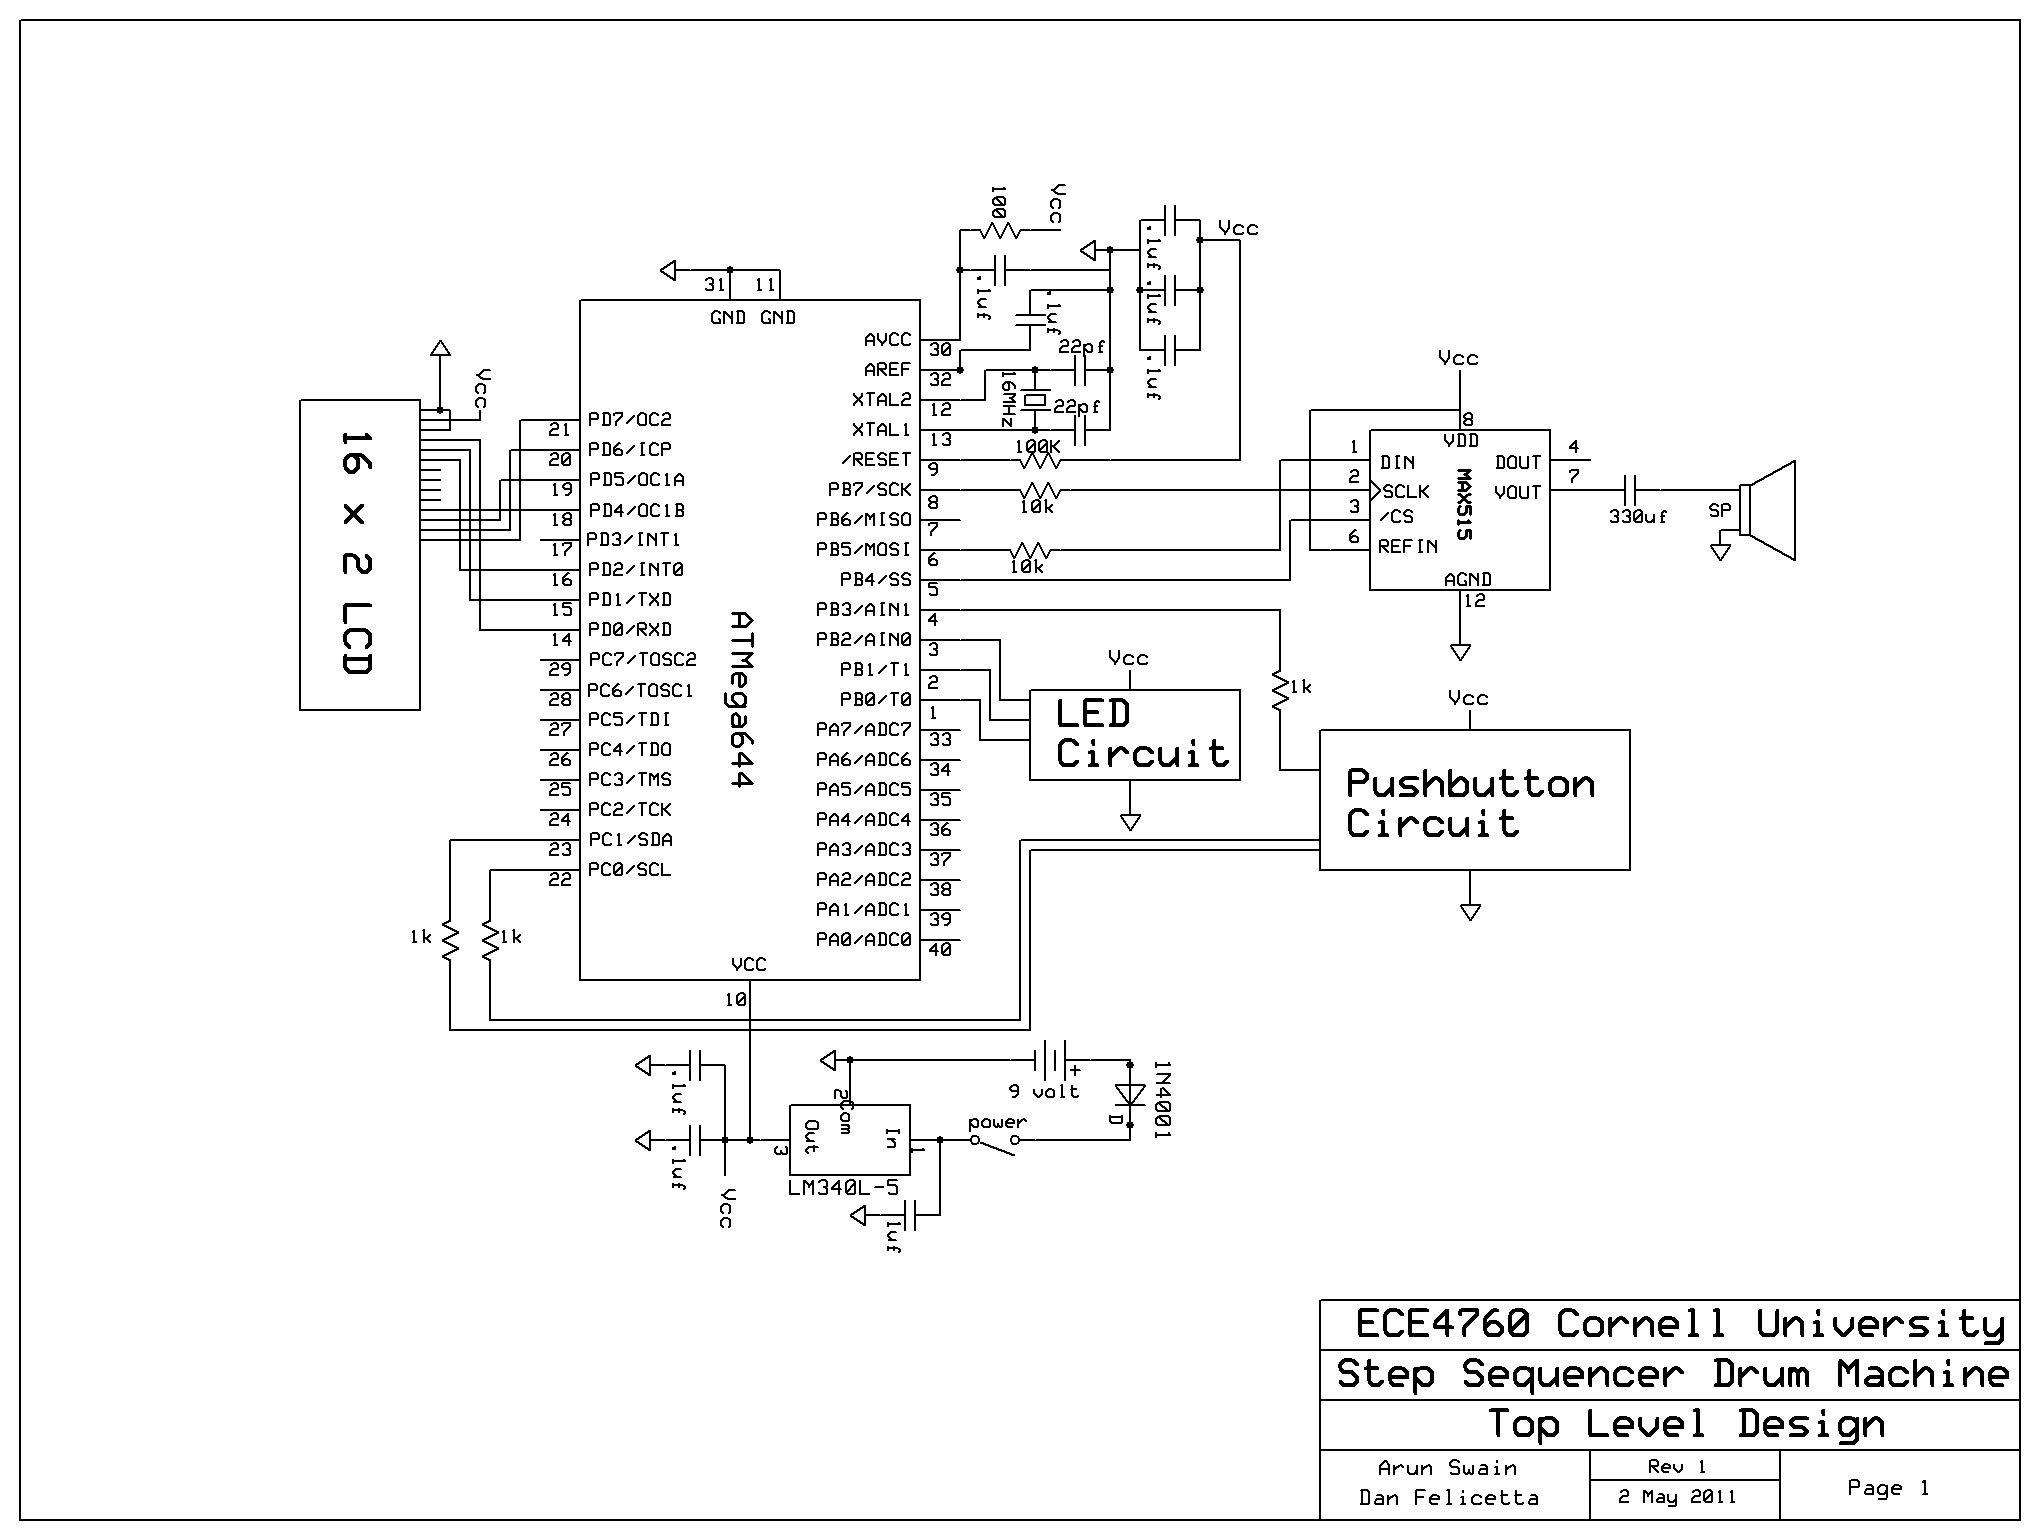 Step Sequencer Drum Machine Using Atmega644 Schemetic